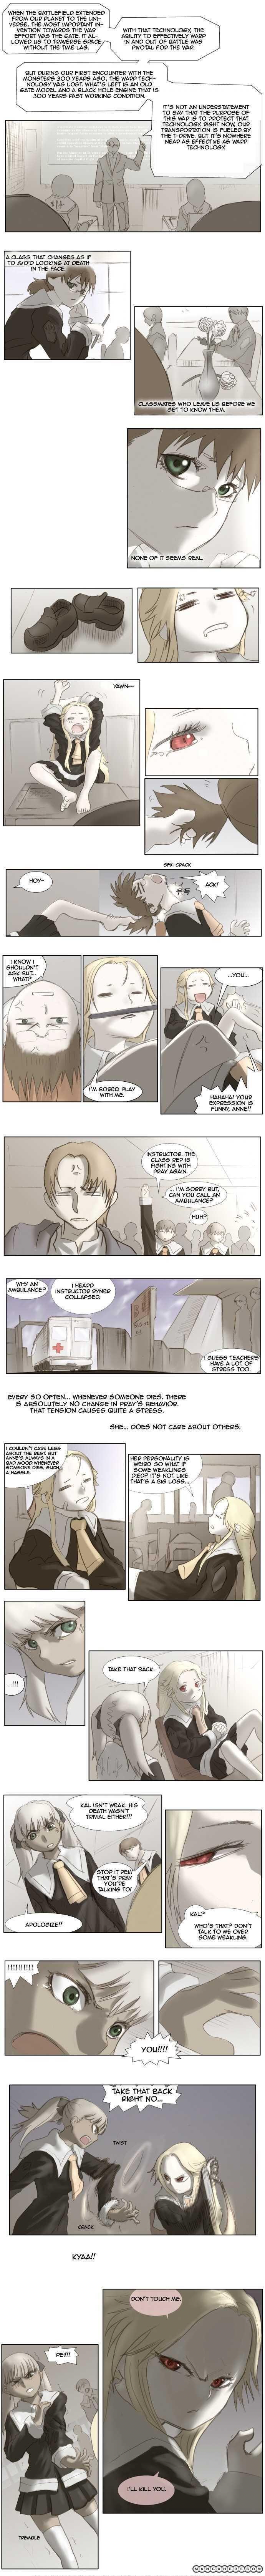 Knight Run 6 Page 3